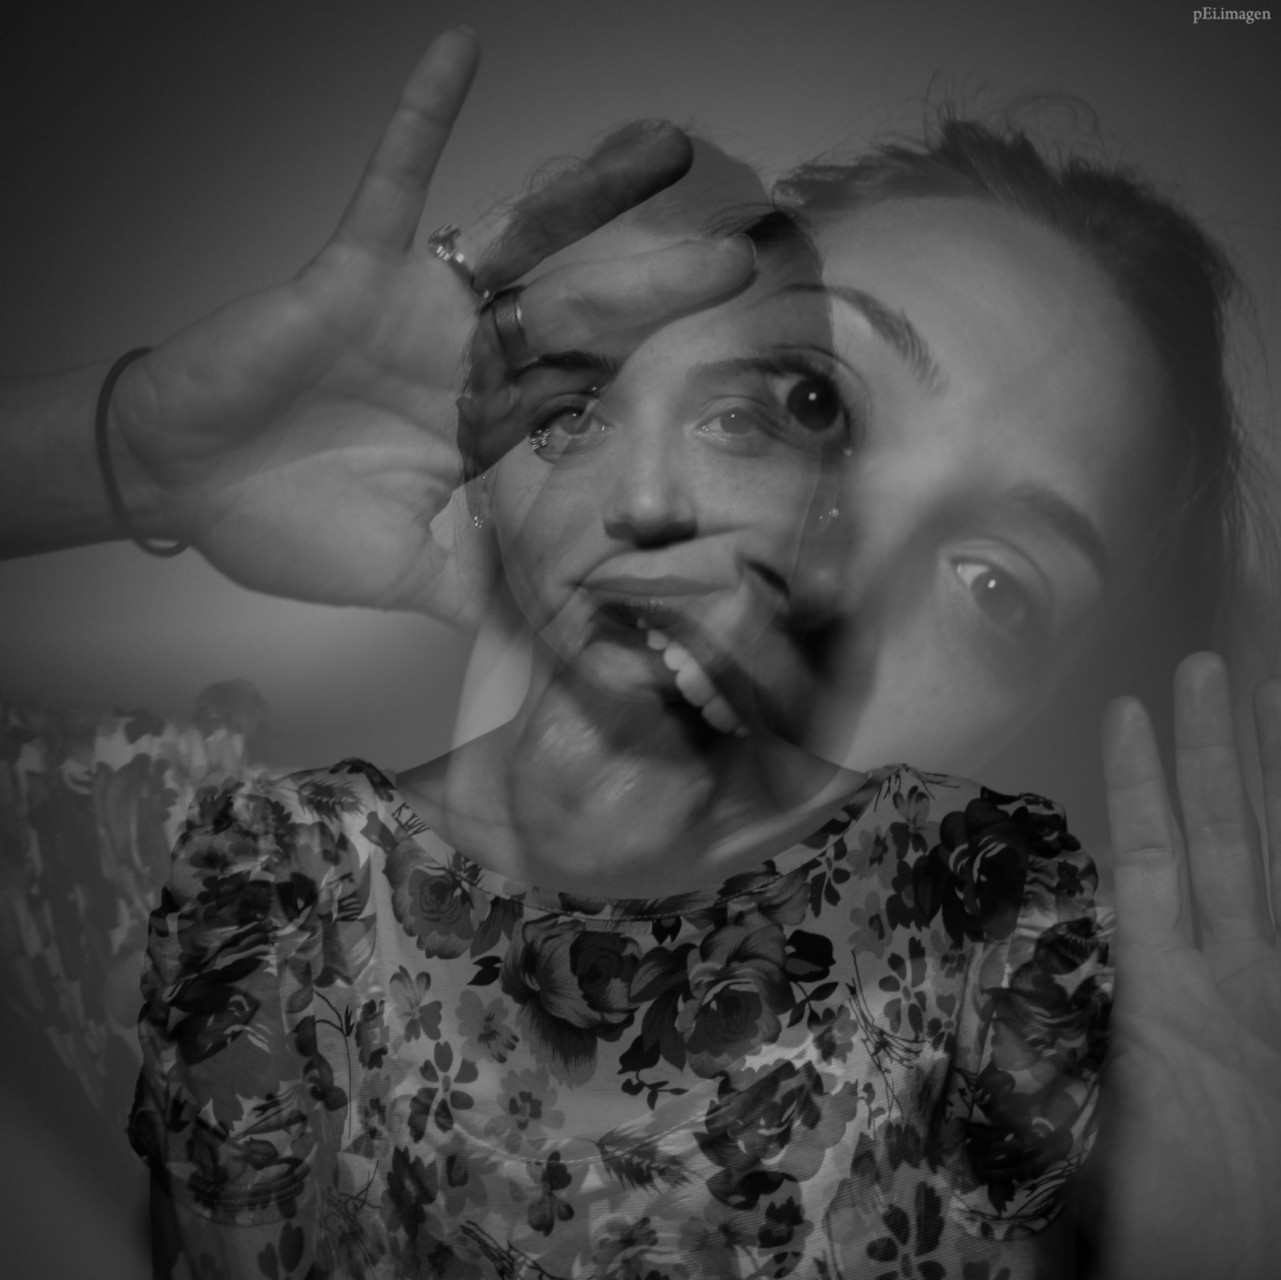 peipegata me myself I proyectos fotografia peipegatafotografia # 108 Antonia Di Carlo